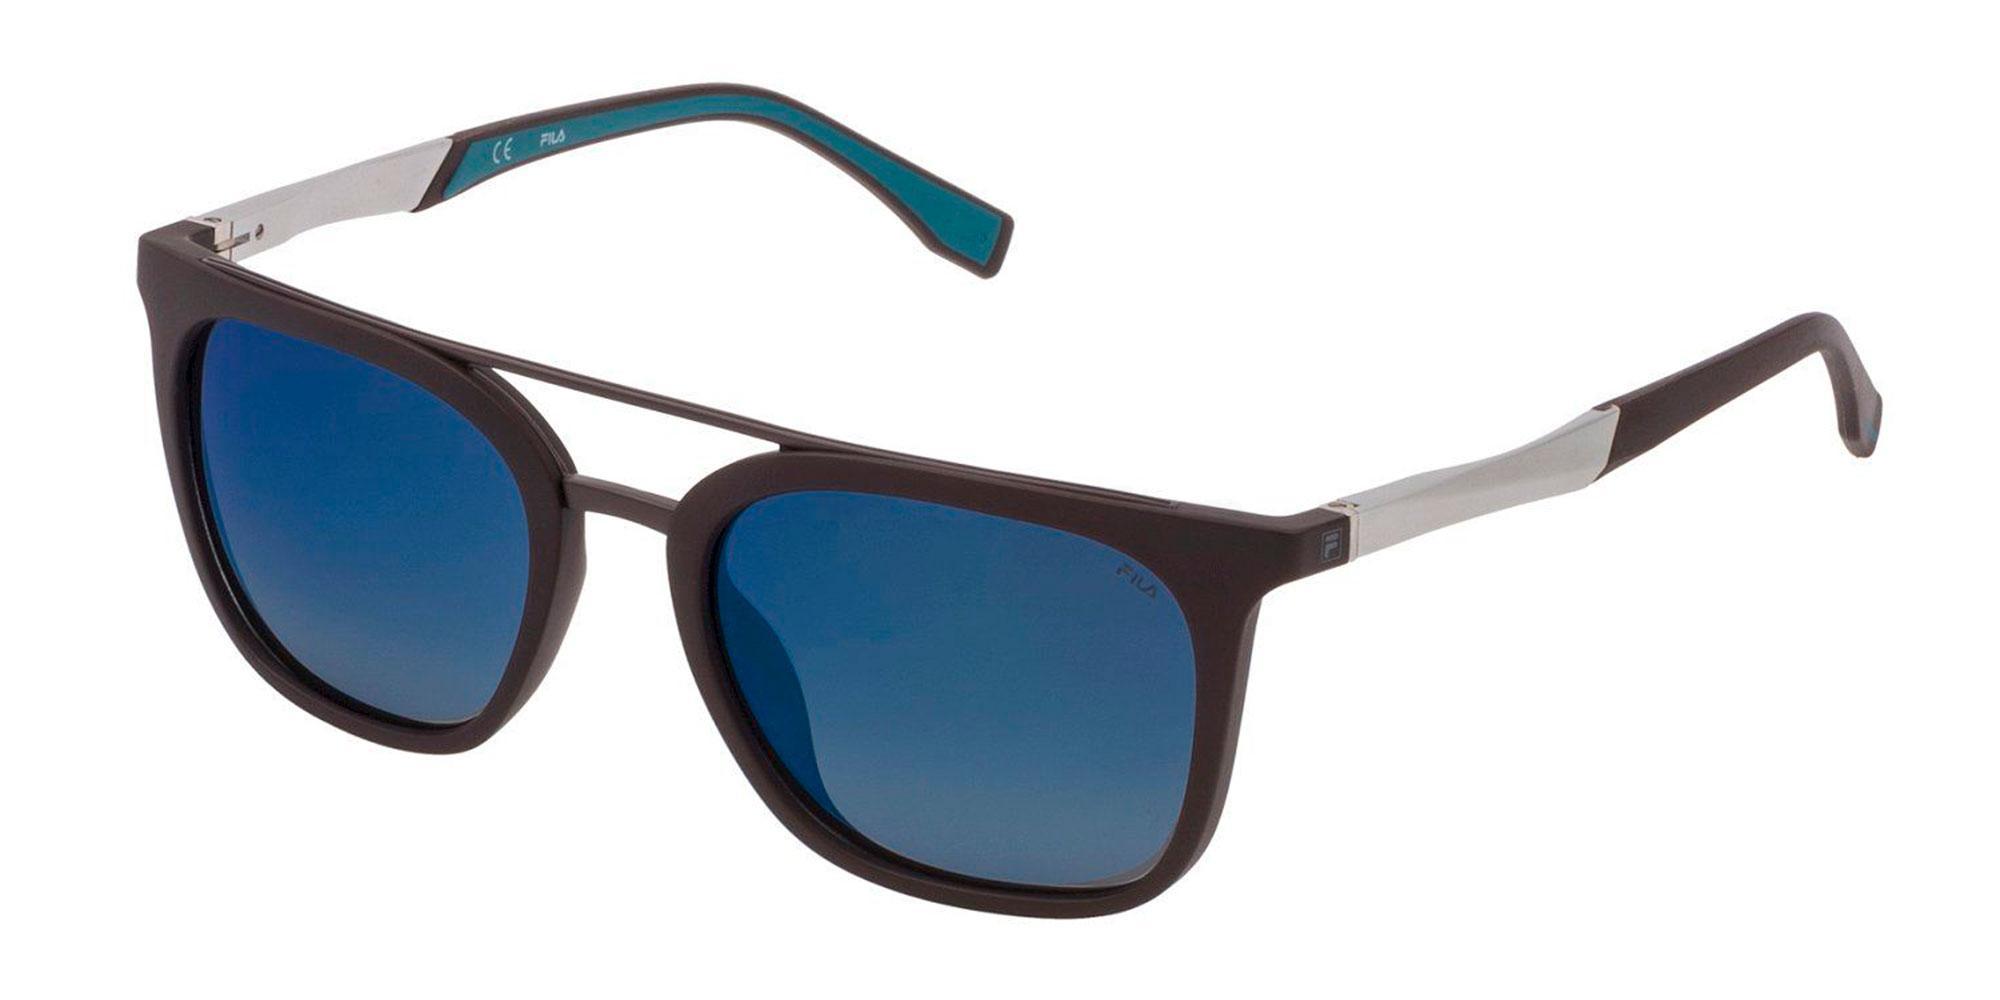 6XKB SF9249 Sunglasses, Fila